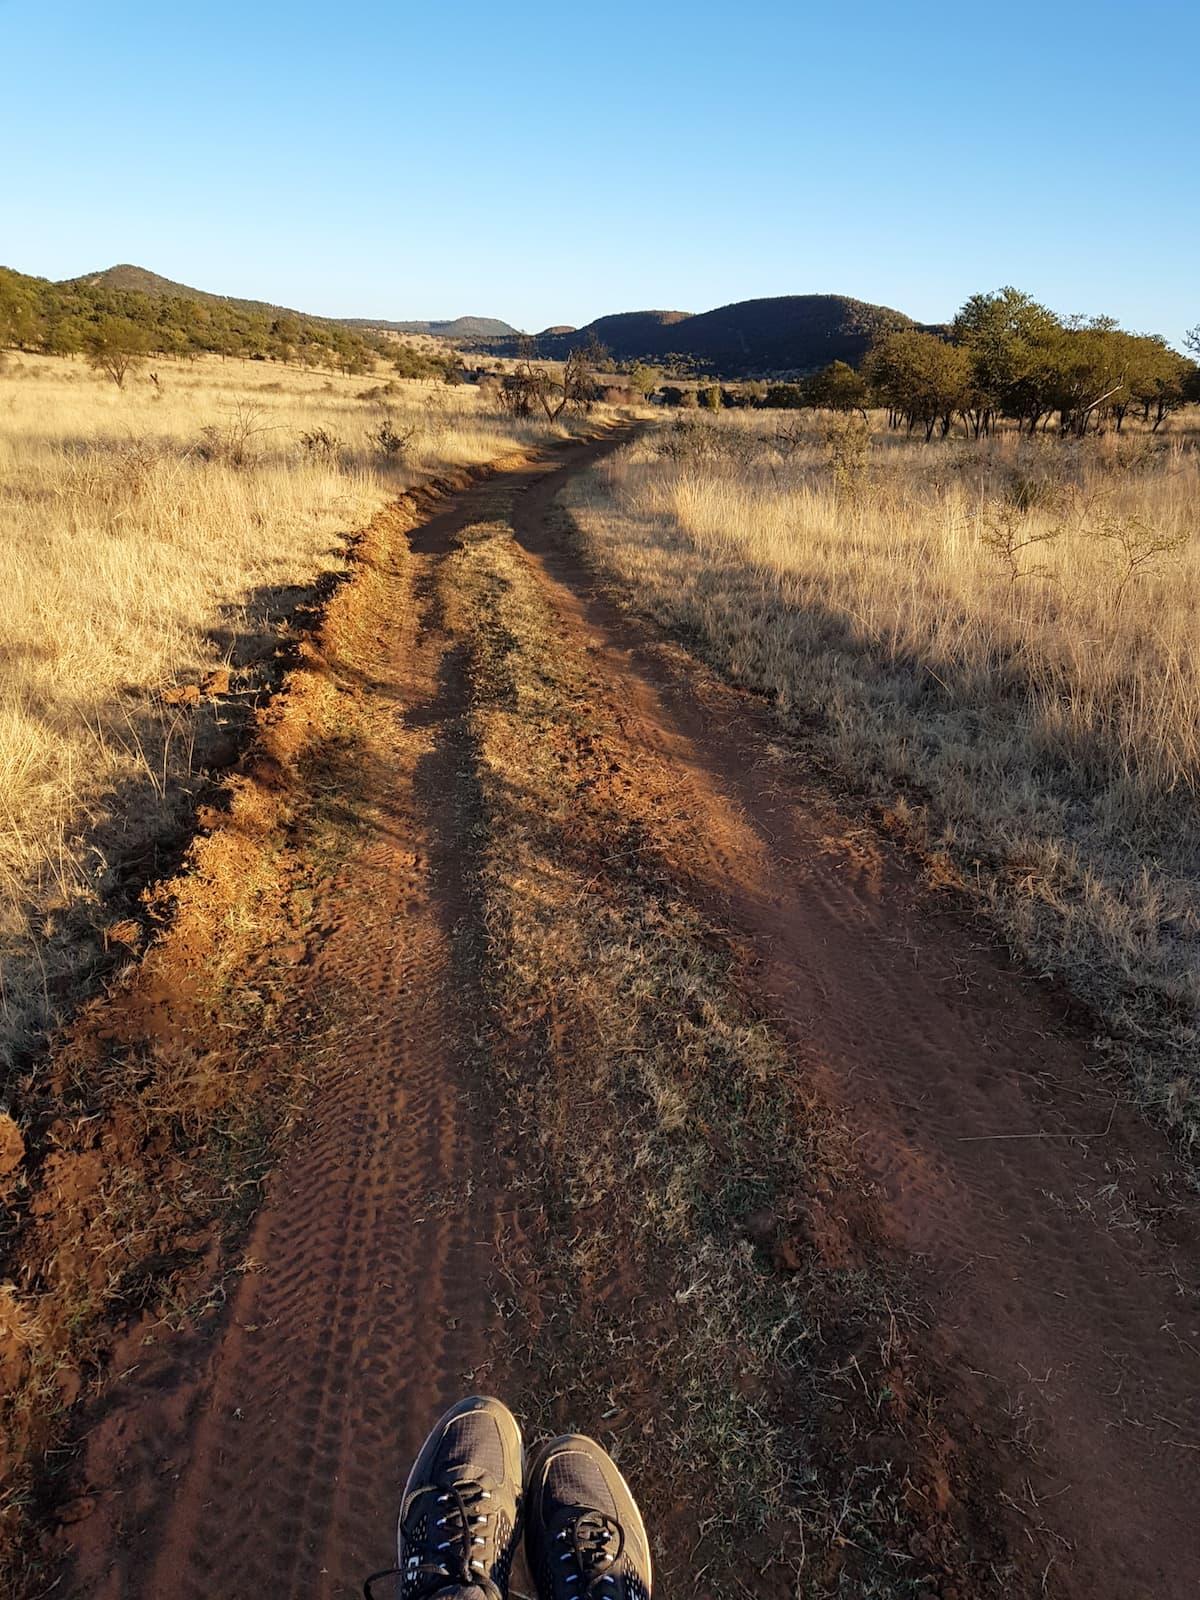 Safari in Südafrika, ChaZen privates Wildreservat: Blick von der Motorhaube. Foto: Lena Ziehres